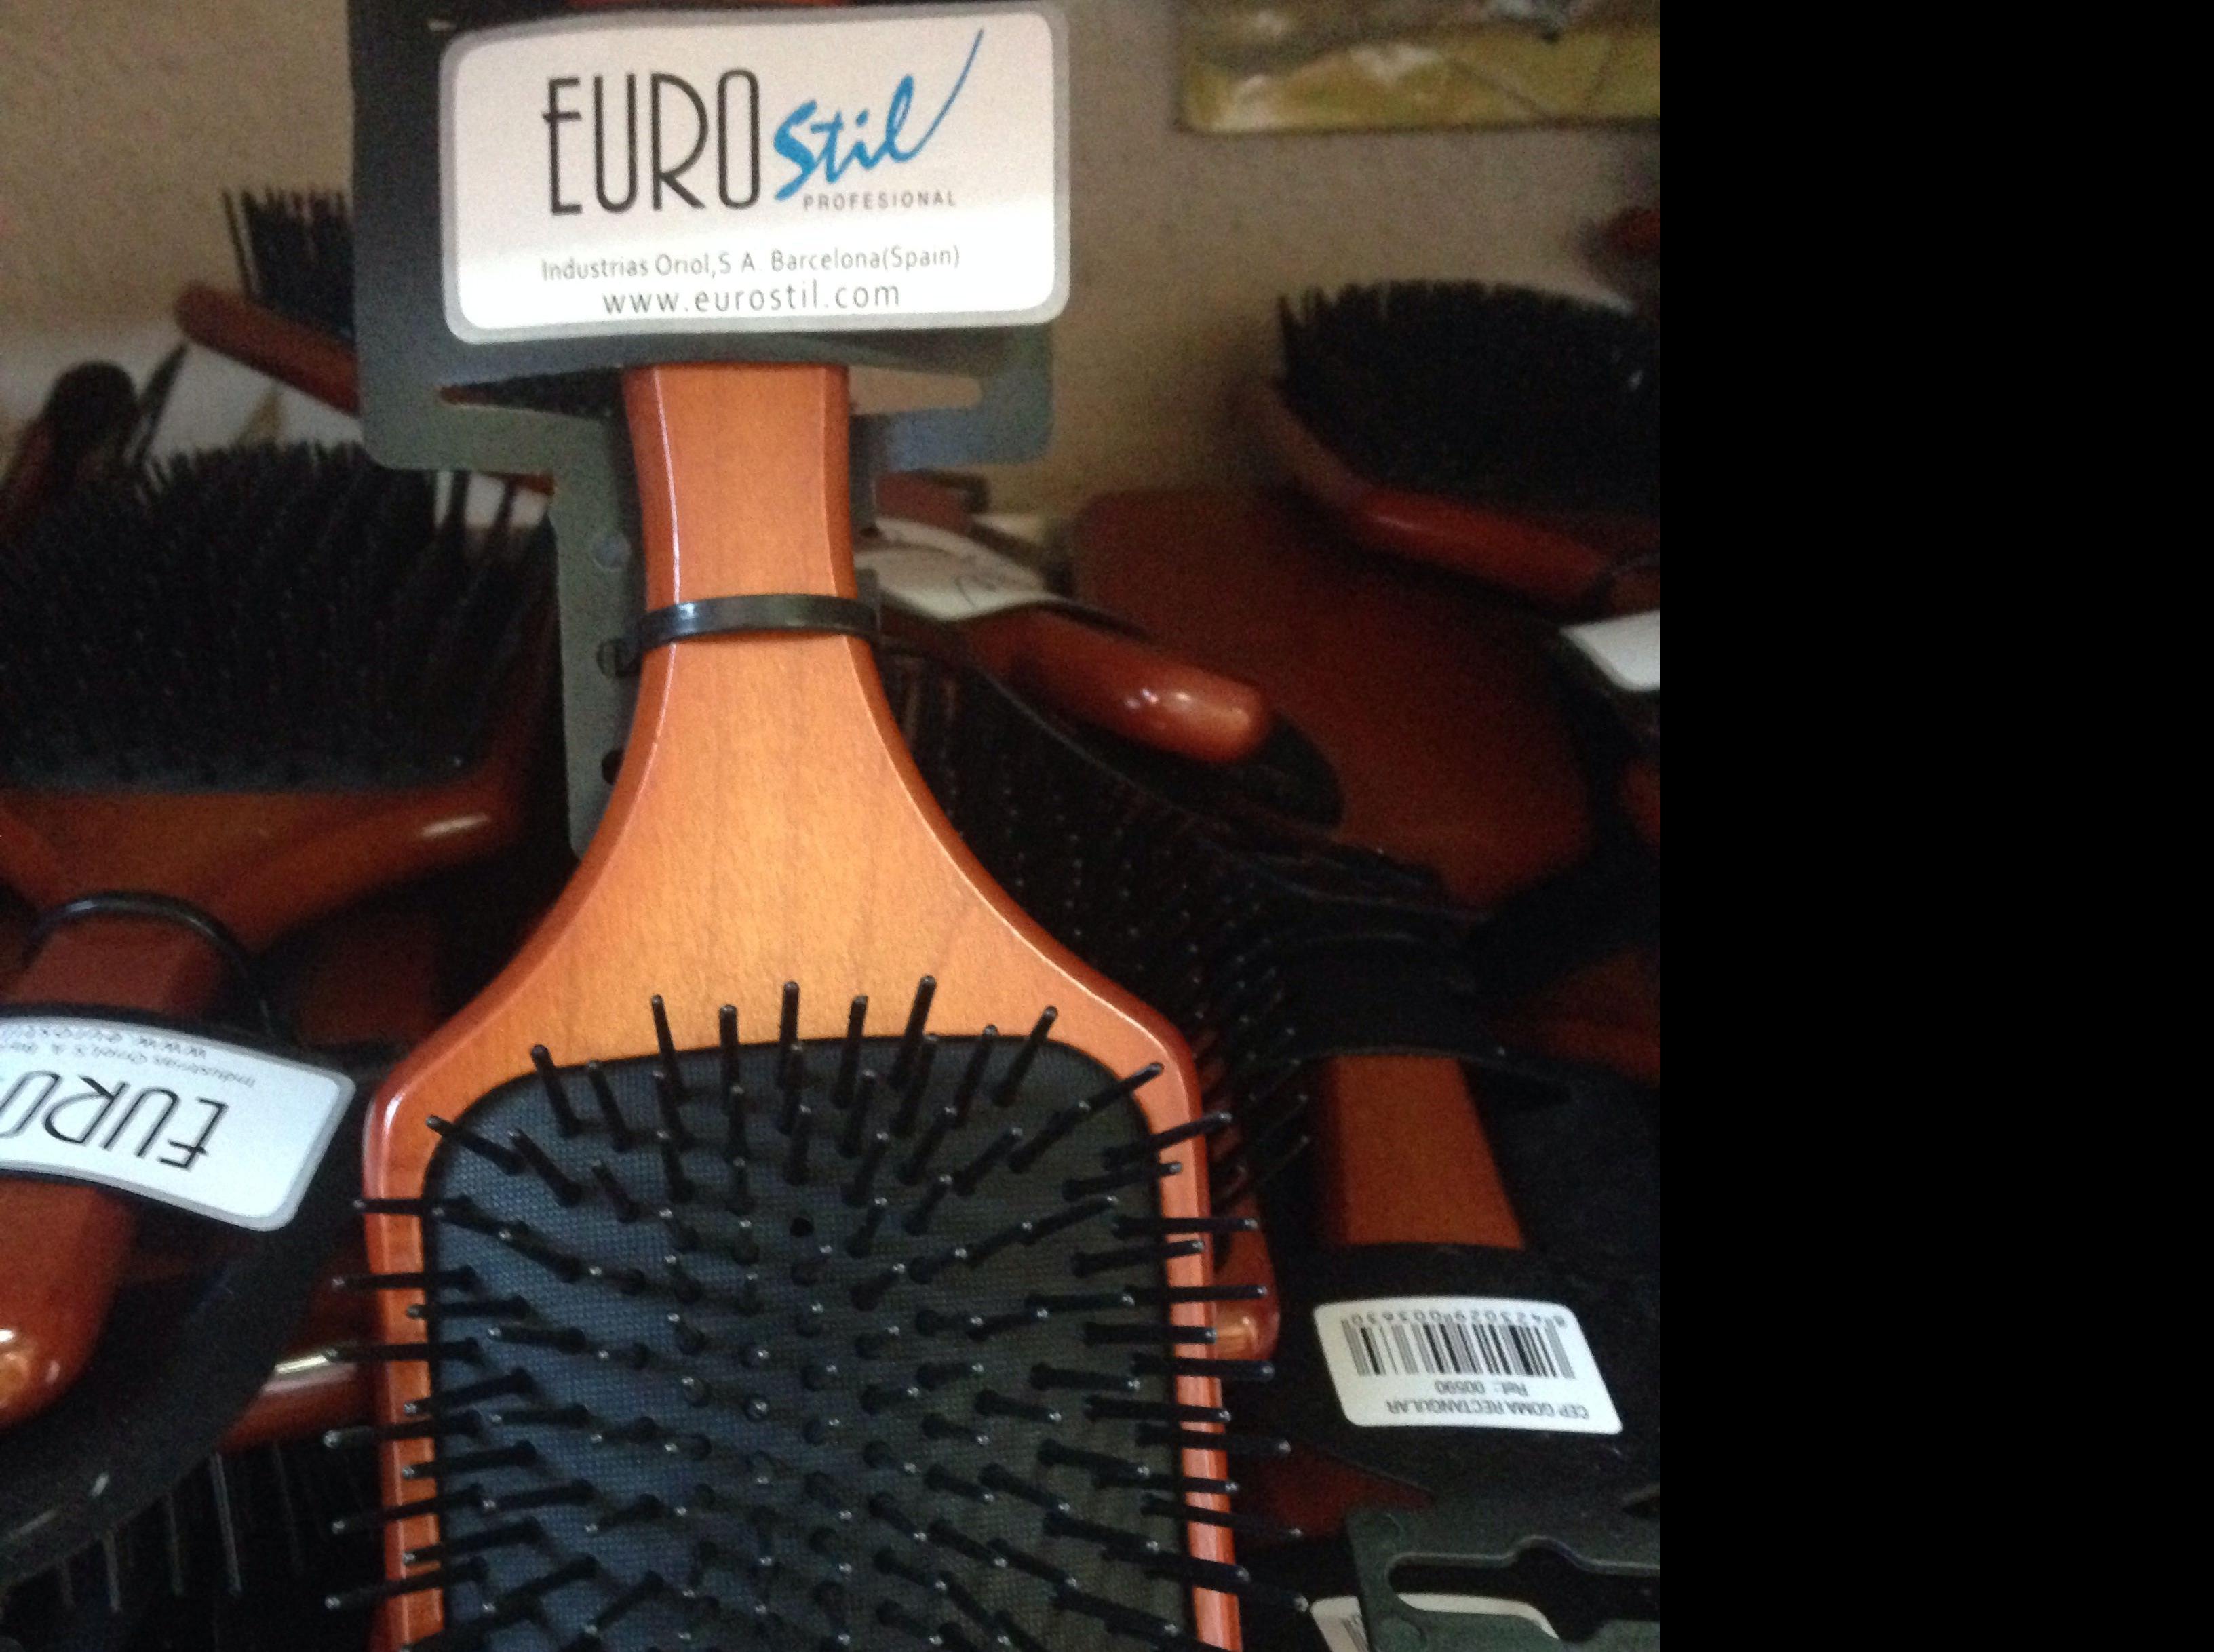 Cepillo euro stil